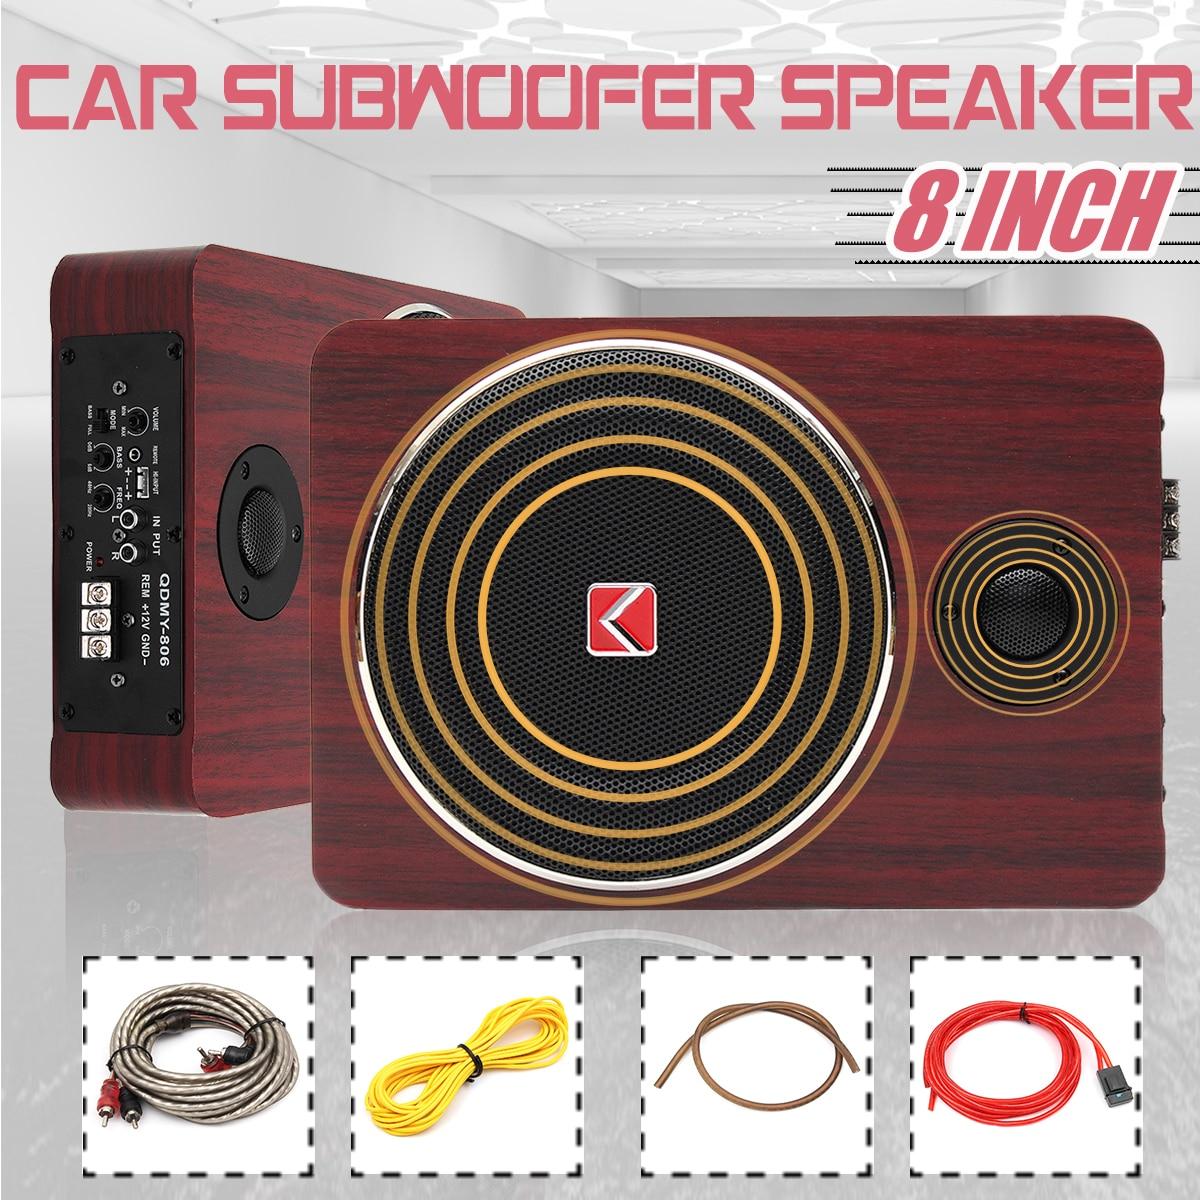 8 zoll 600W Auto Subwoofer Speaker12V Auto Aktive Power Audio Stereo Messing Subwoofer Verstärker Lautsprecher